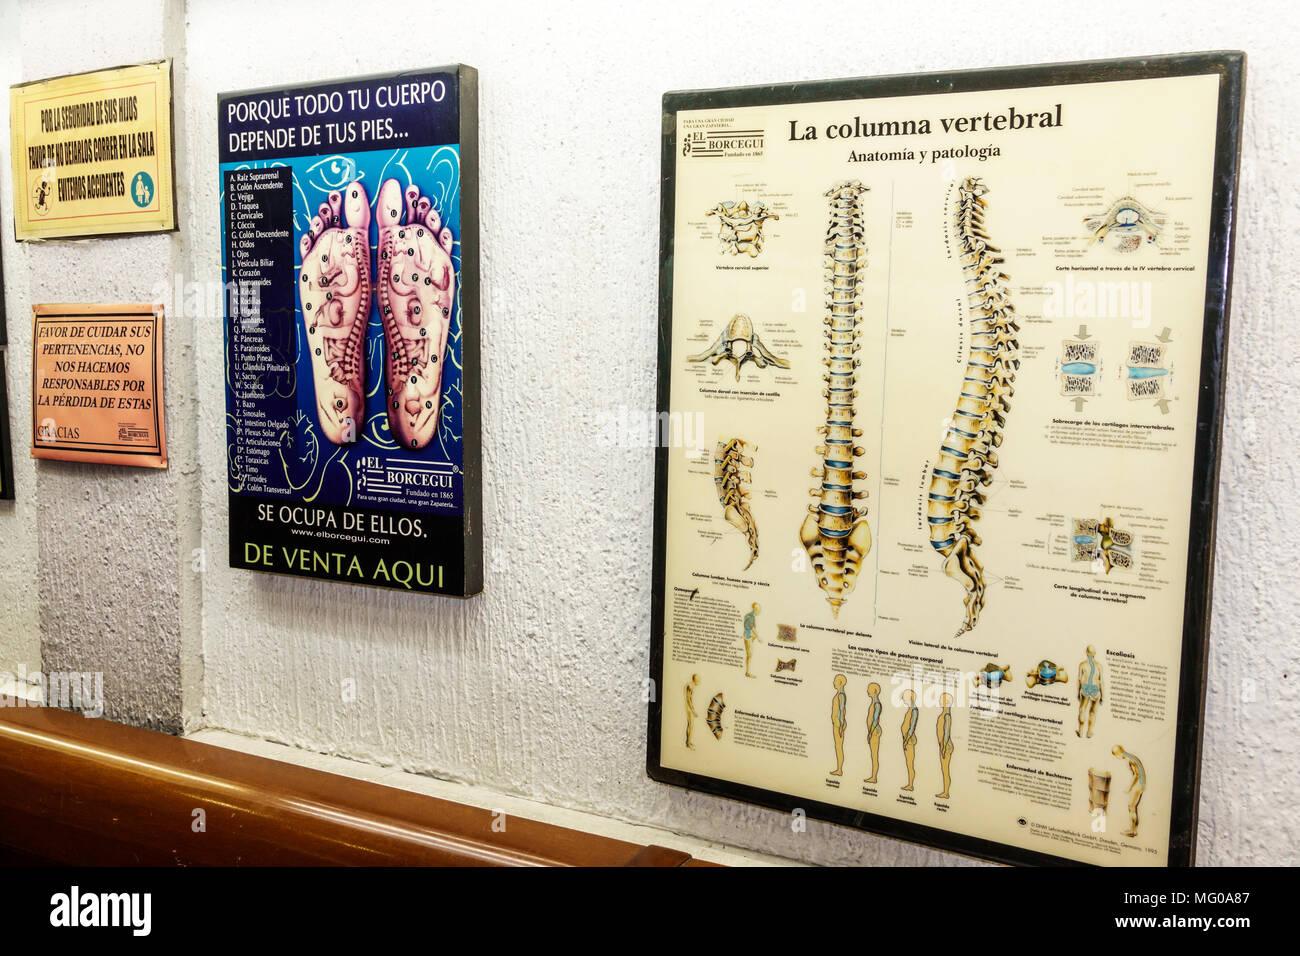 Anatomy Poster Stock Photos & Anatomy Poster Stock Images - Alamy